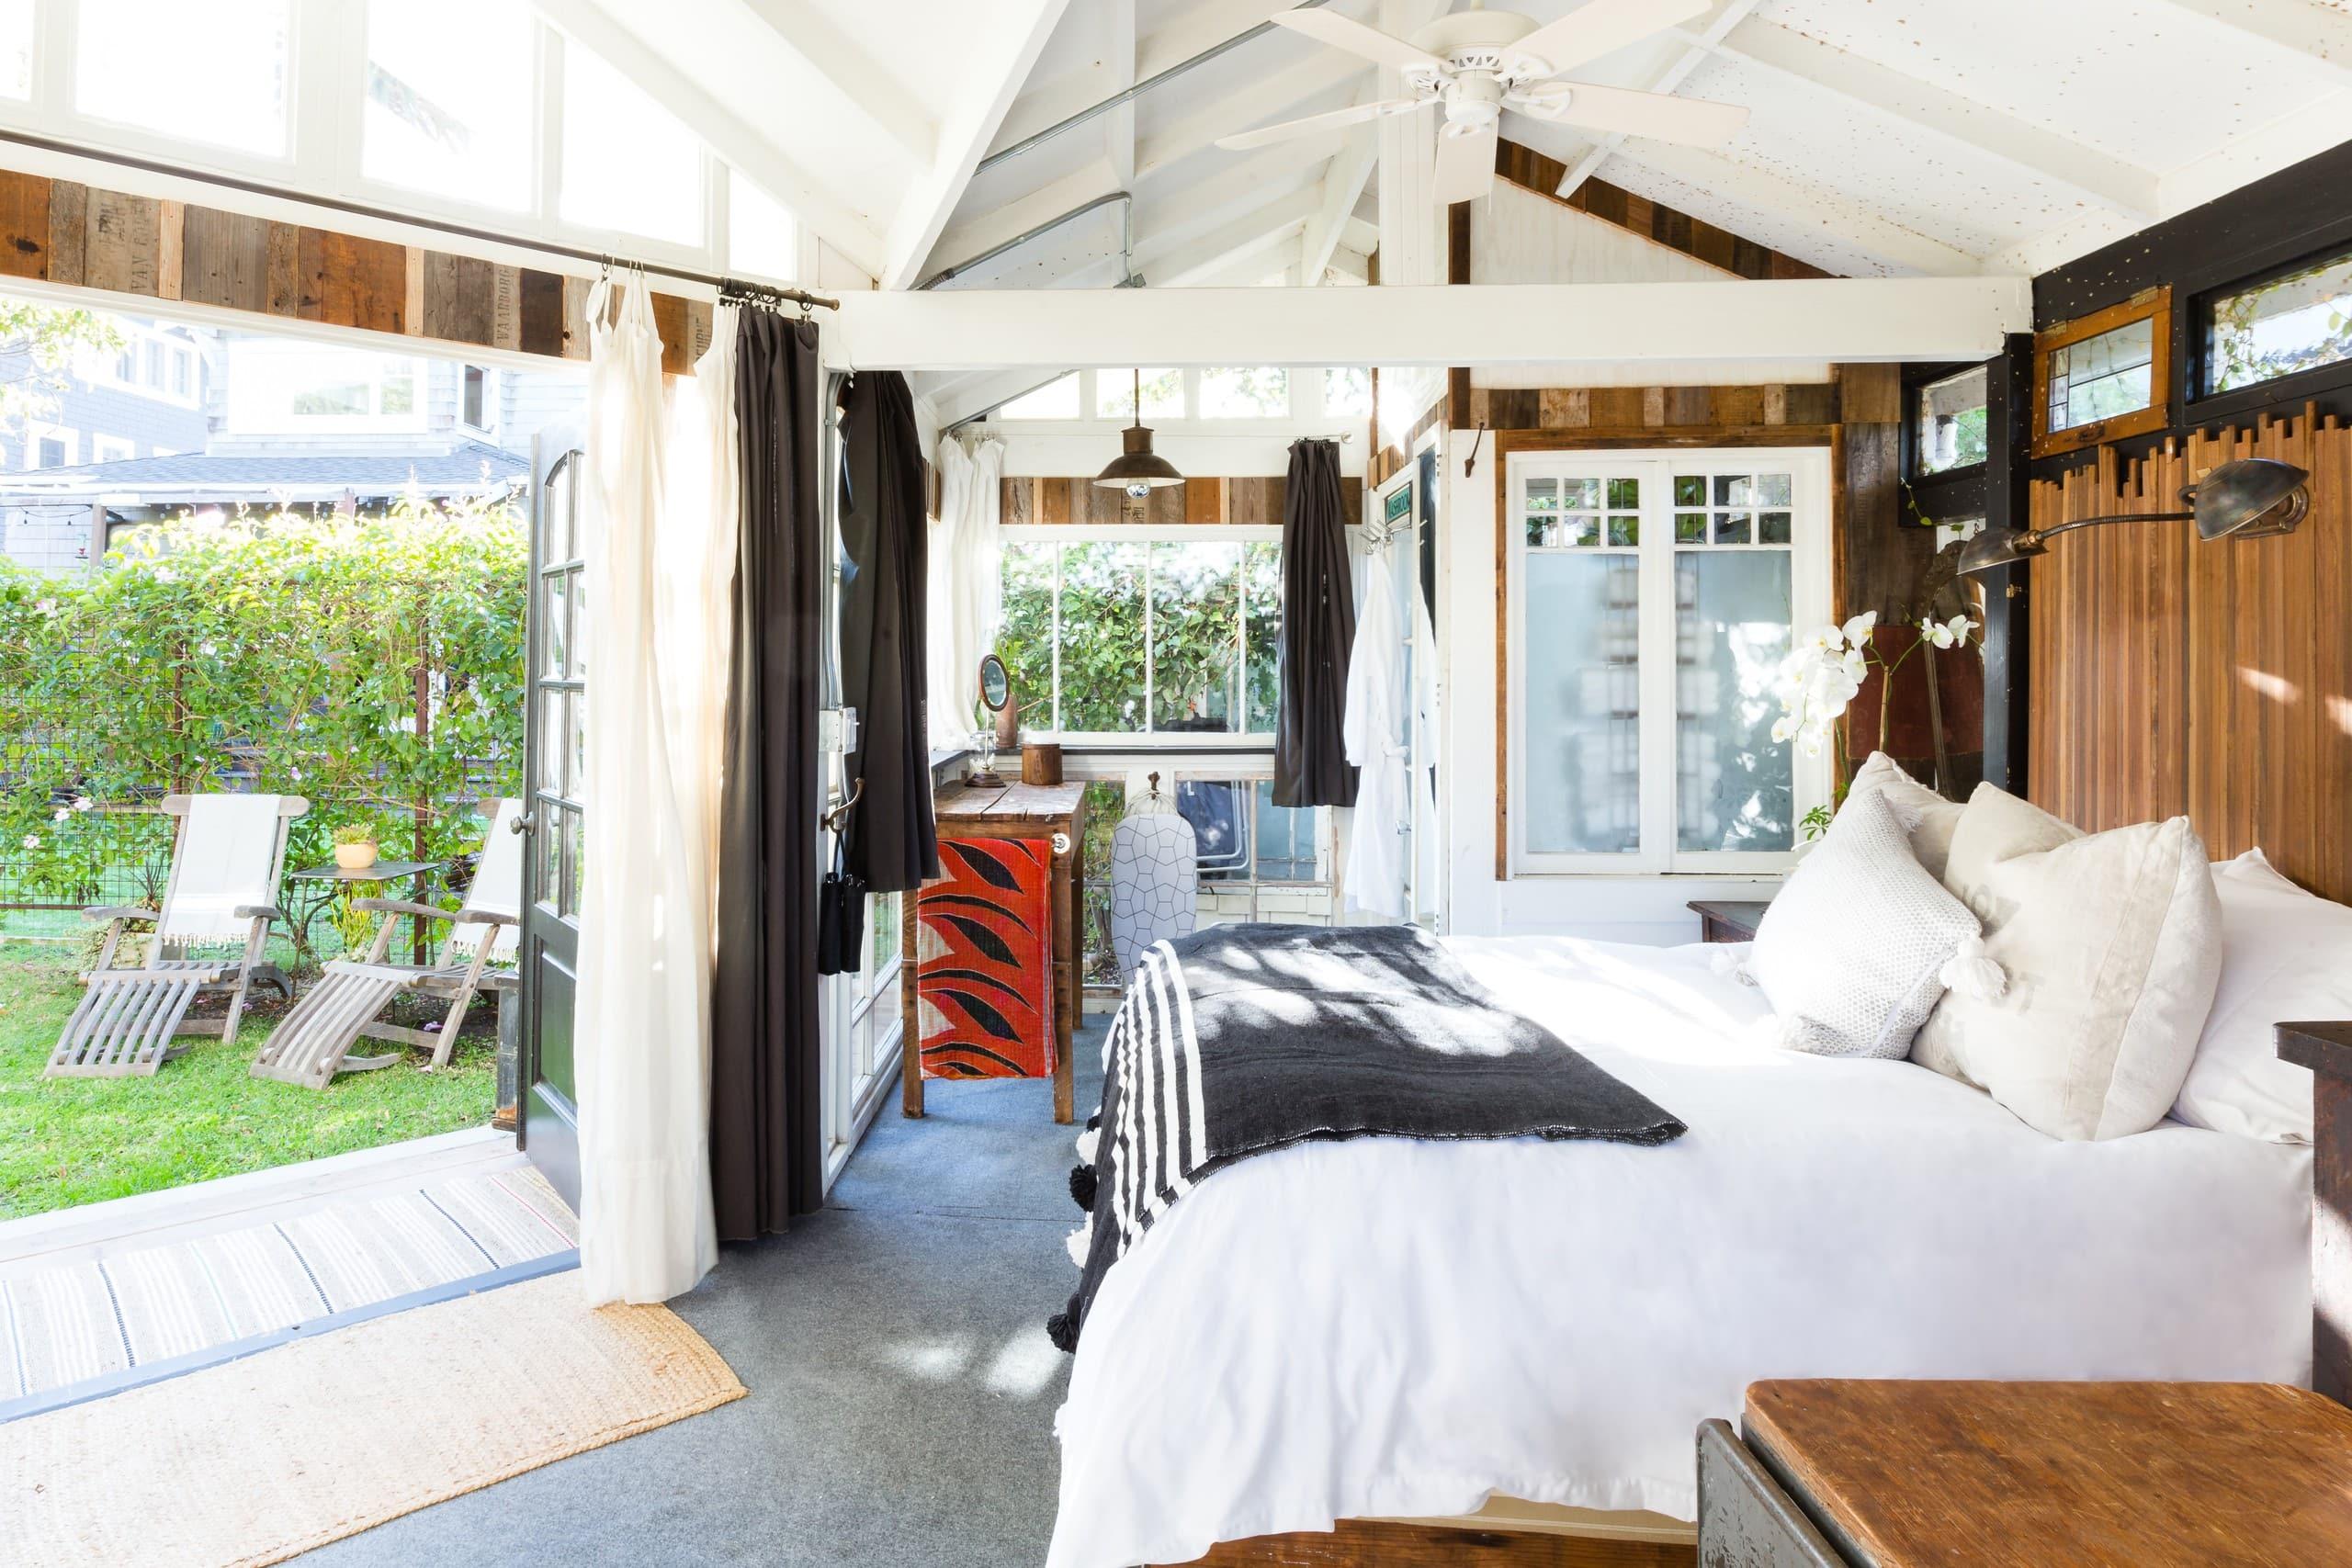 Room To Rent Venice Beach